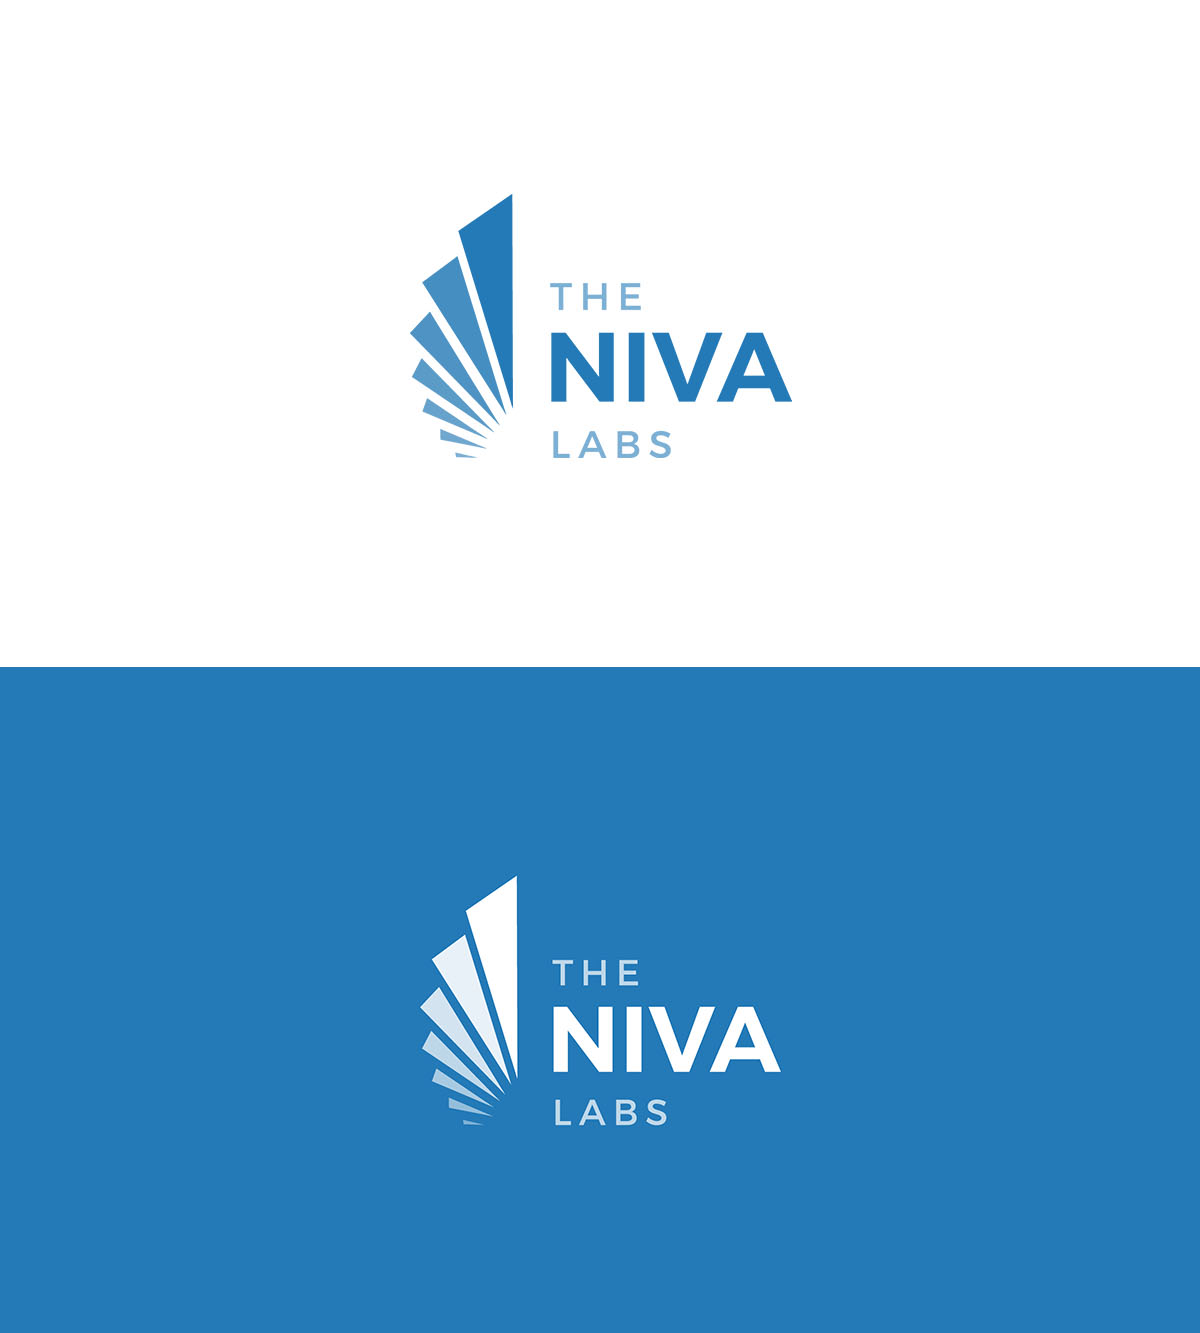 Blue Niva logo on white background and White Niva Logo on blue background.